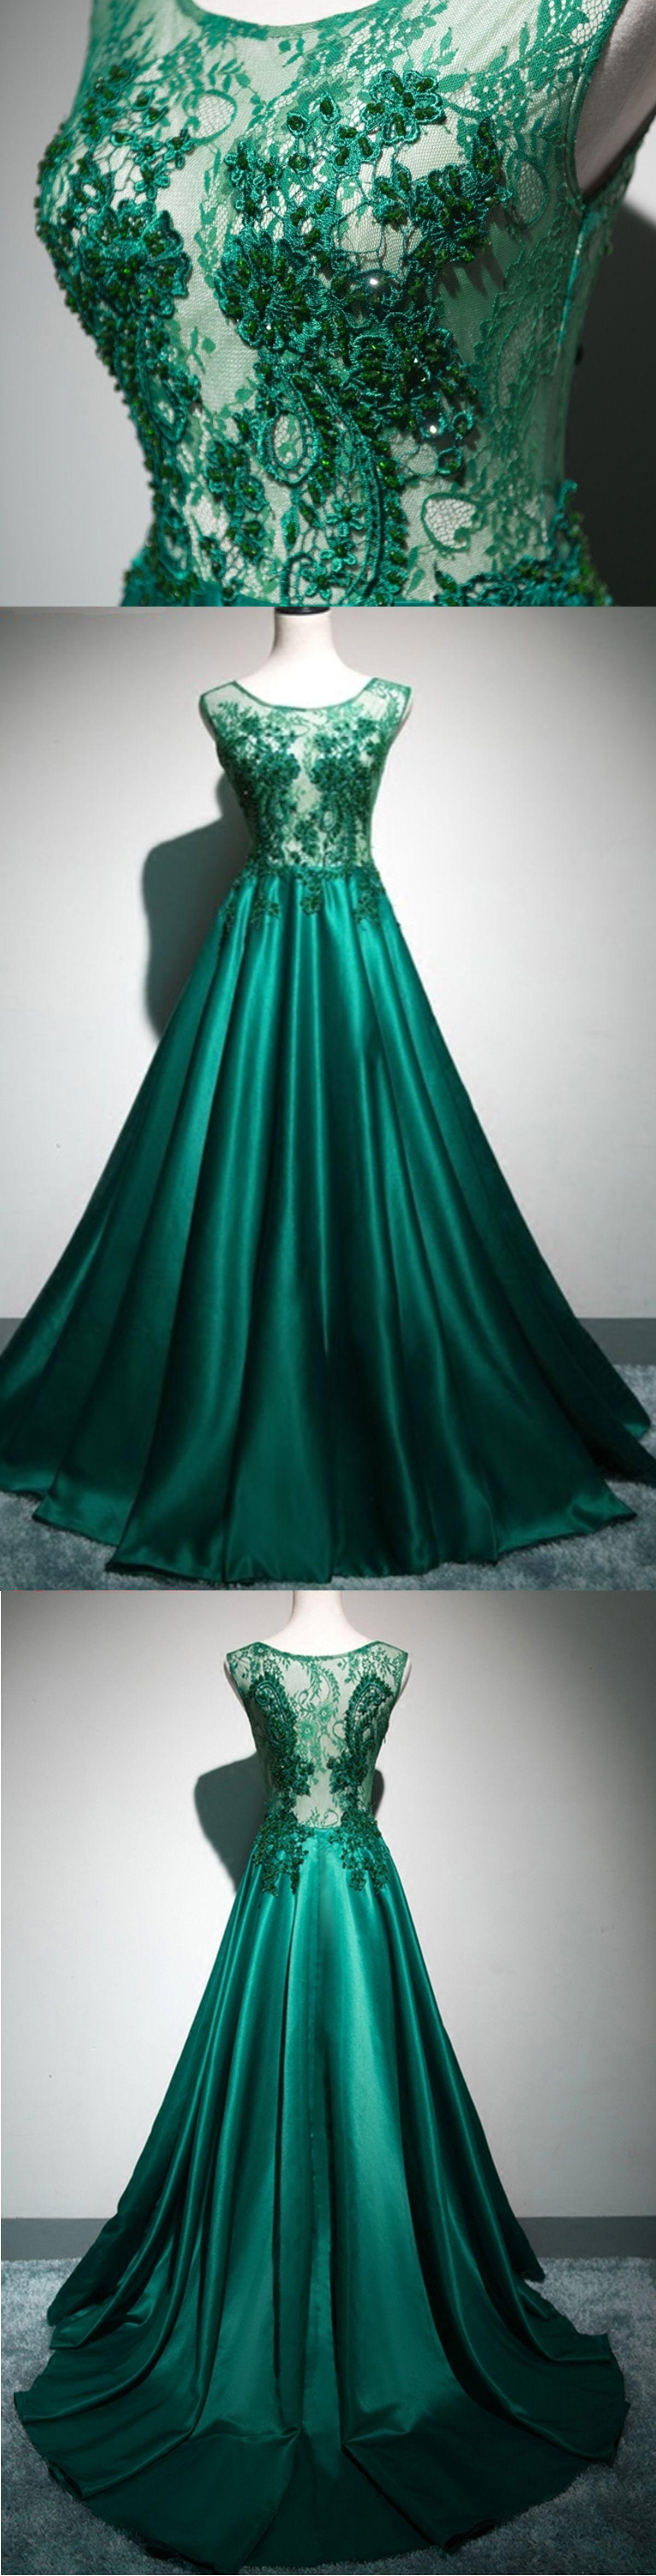 Deep green satin long lace top see through evening dresses, long ...